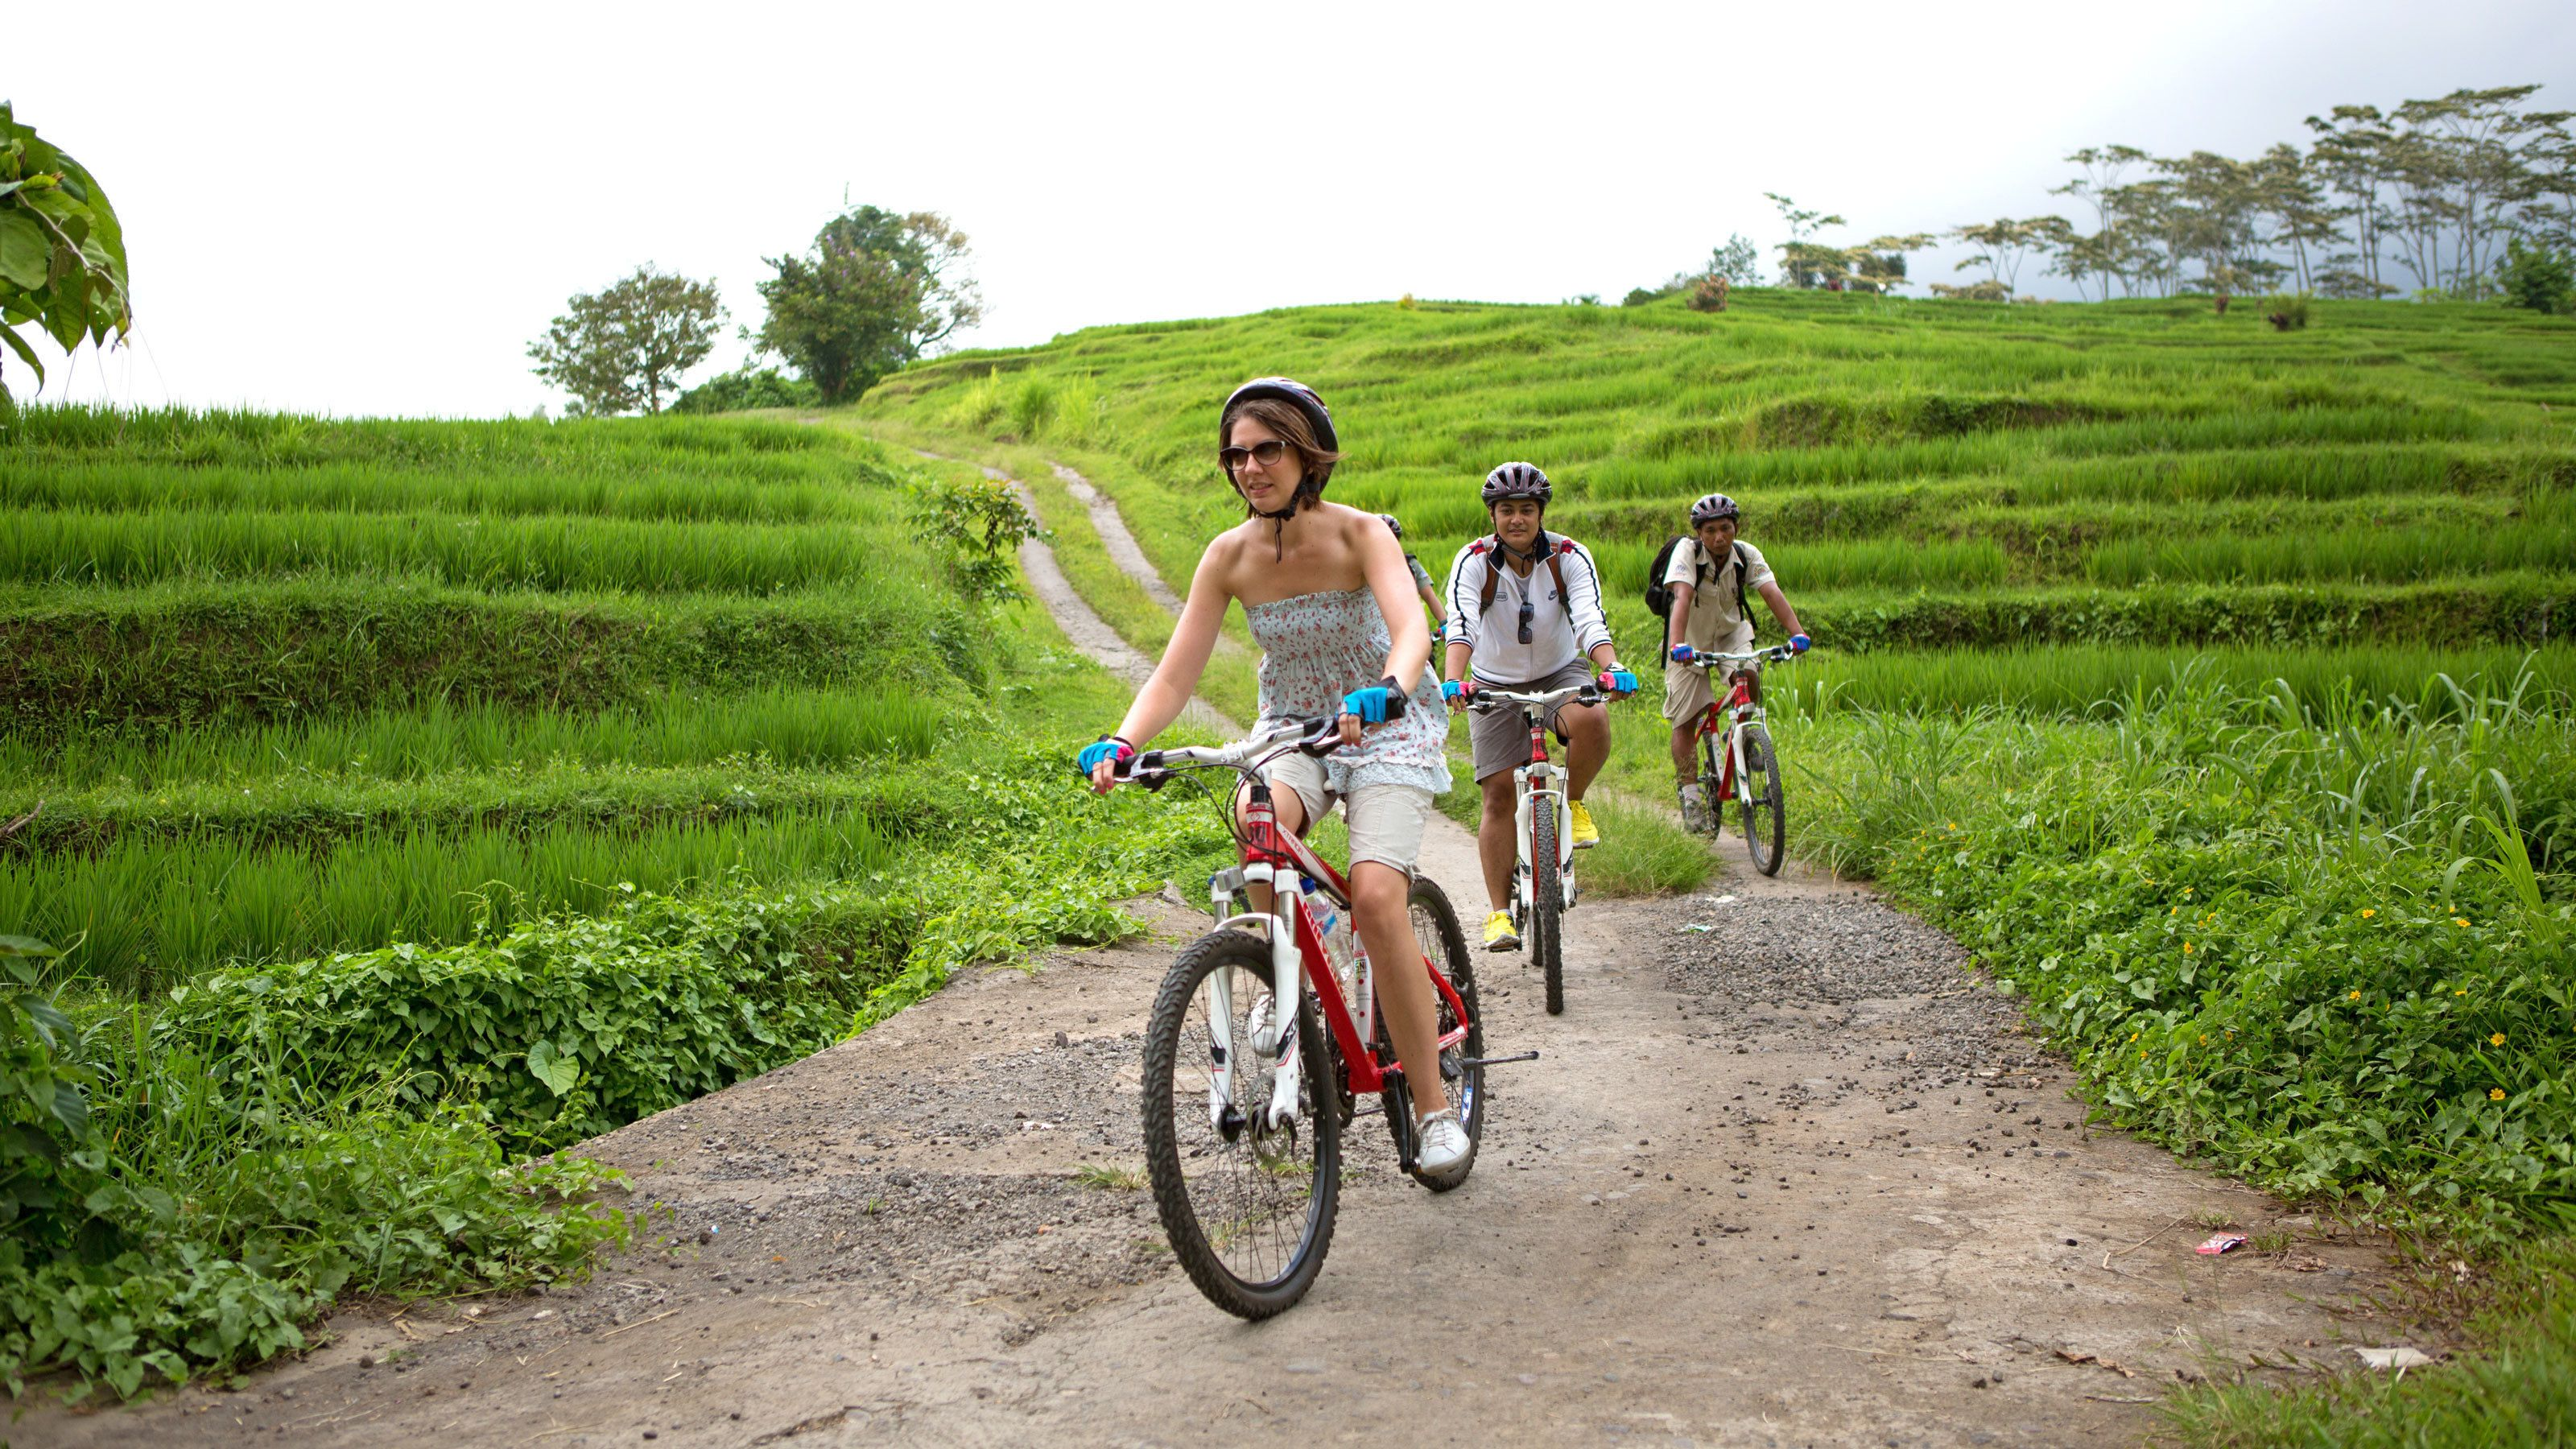 cyclists biking down a hilly dirt path in Bali